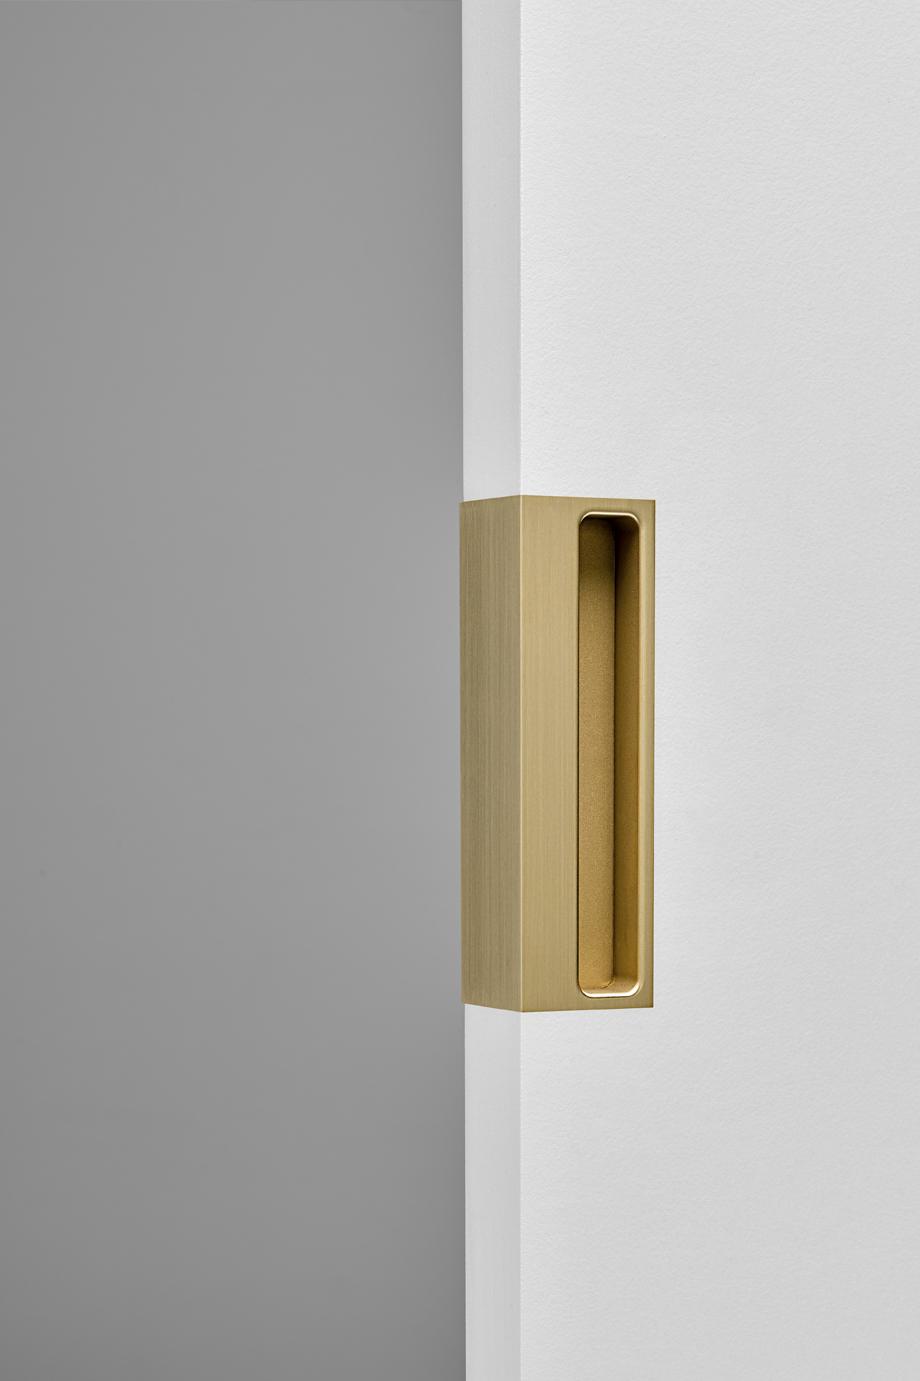 BitPart-Brooke Holm-Megan Morton-Brass-Flush Pull-Deep-150mm.jpg